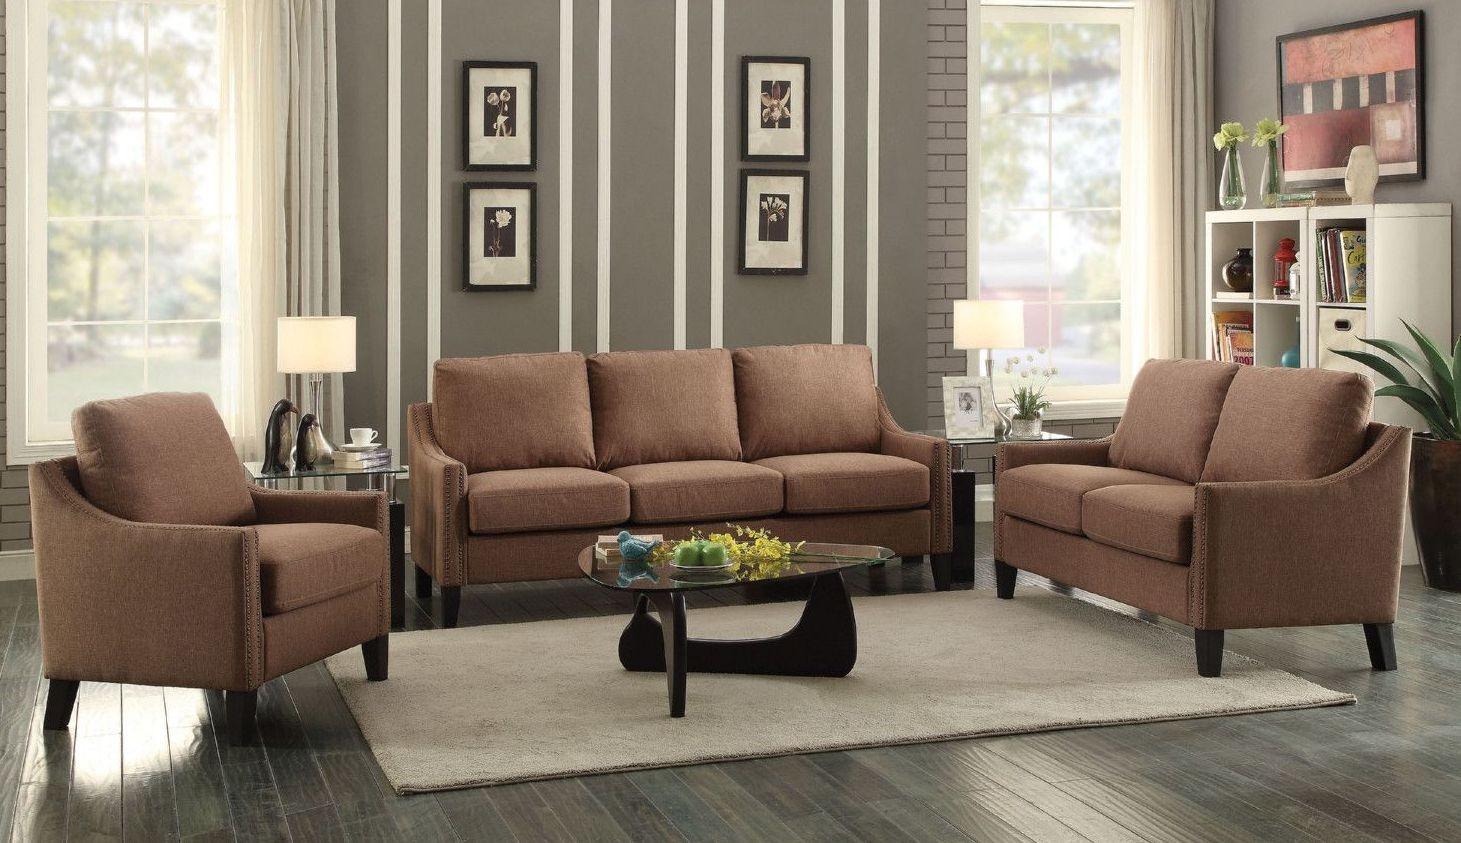 Zapata jr brown linen sofa media gallery 1